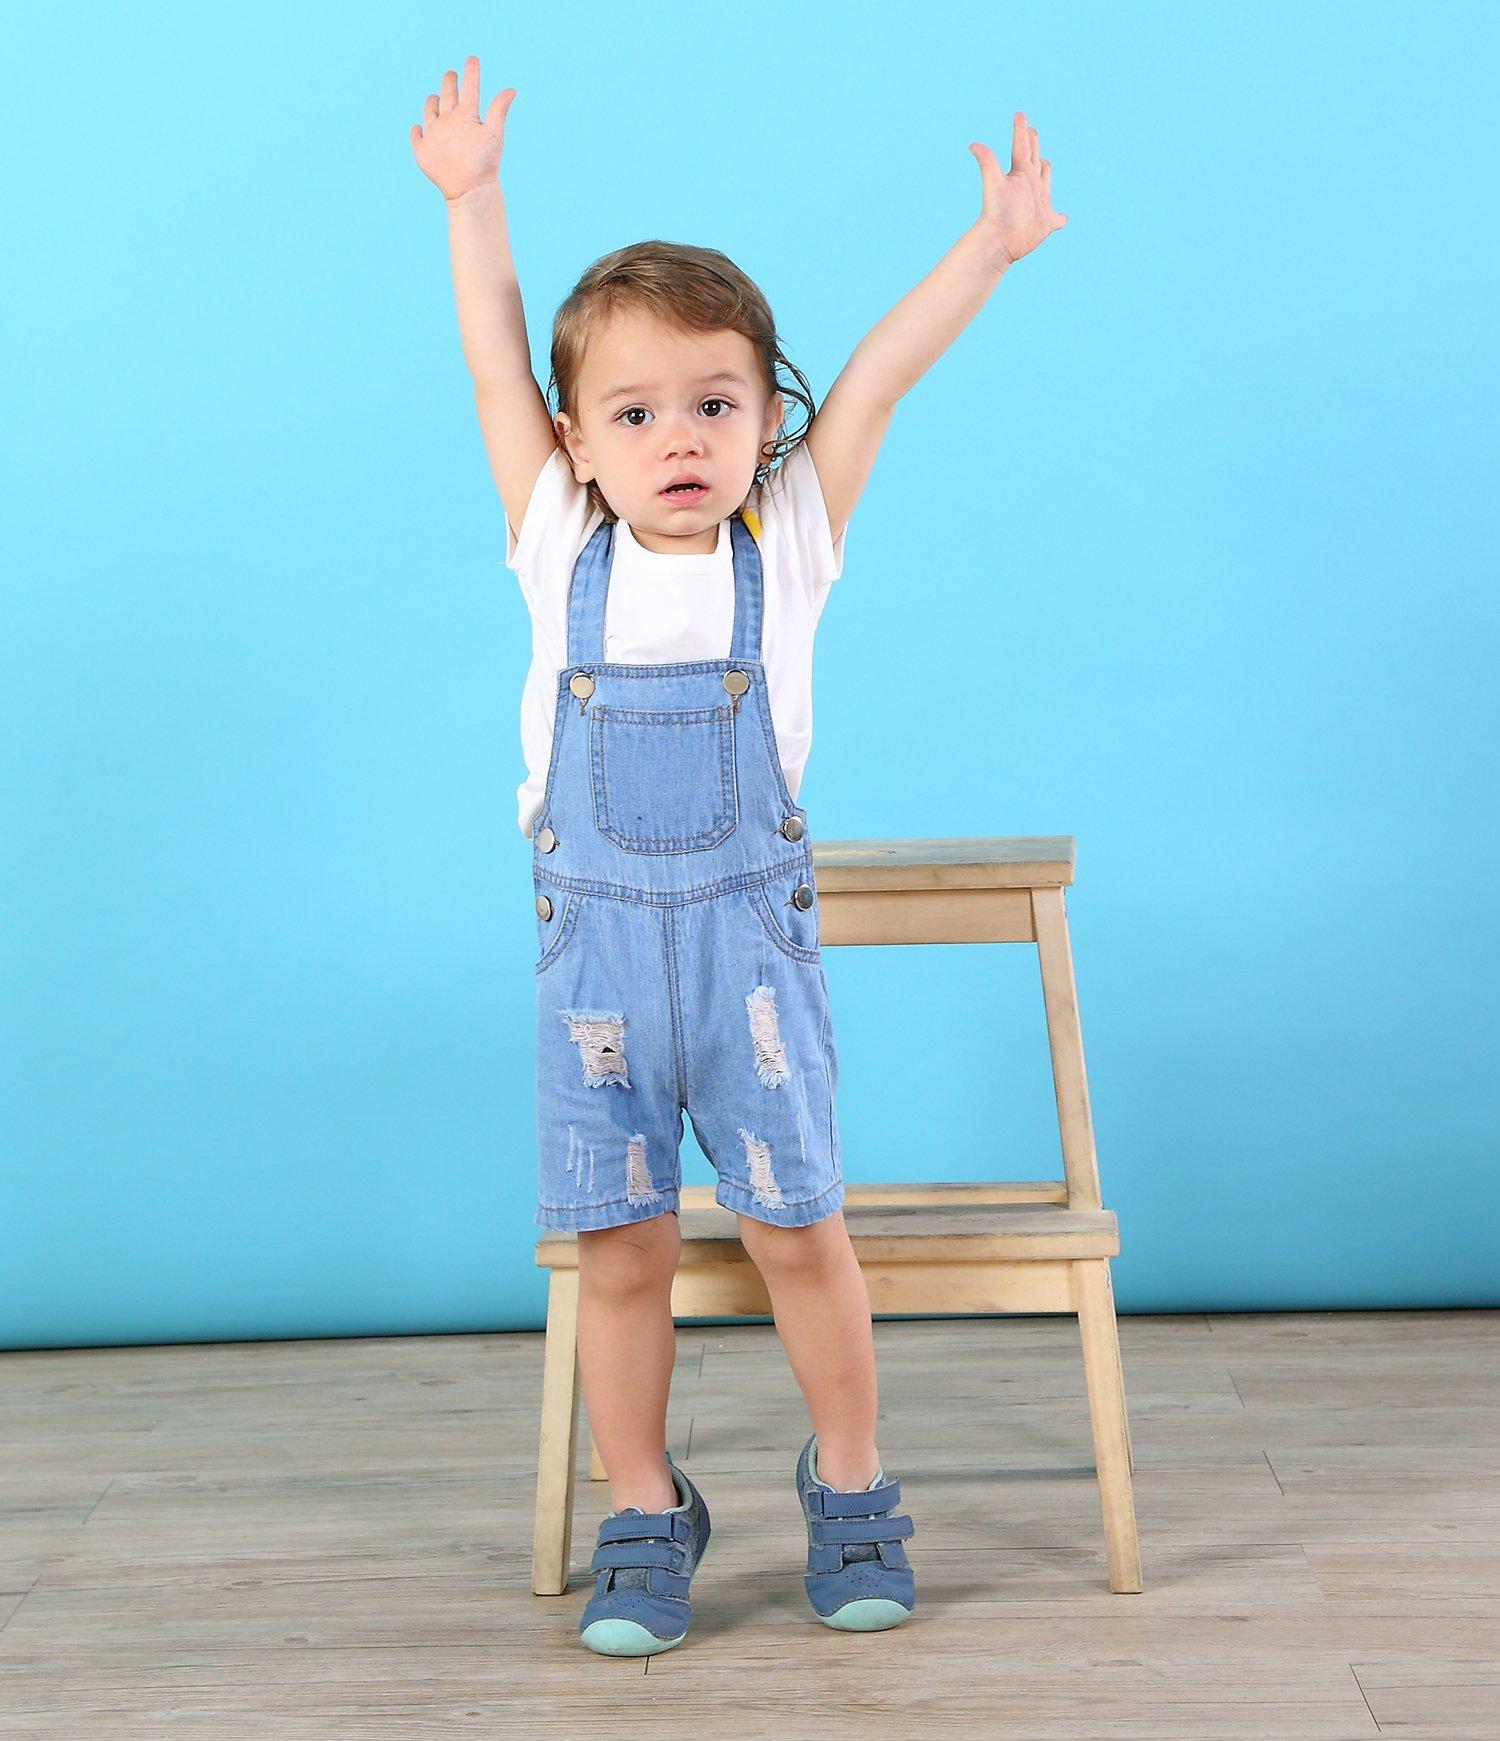 Kidscool Baby & Toddler Girls/Boys Big Bibs Ripped Hole Summer Jeans Shortalls,Light Blue,4-5 Years by Kidscool (Image #4)